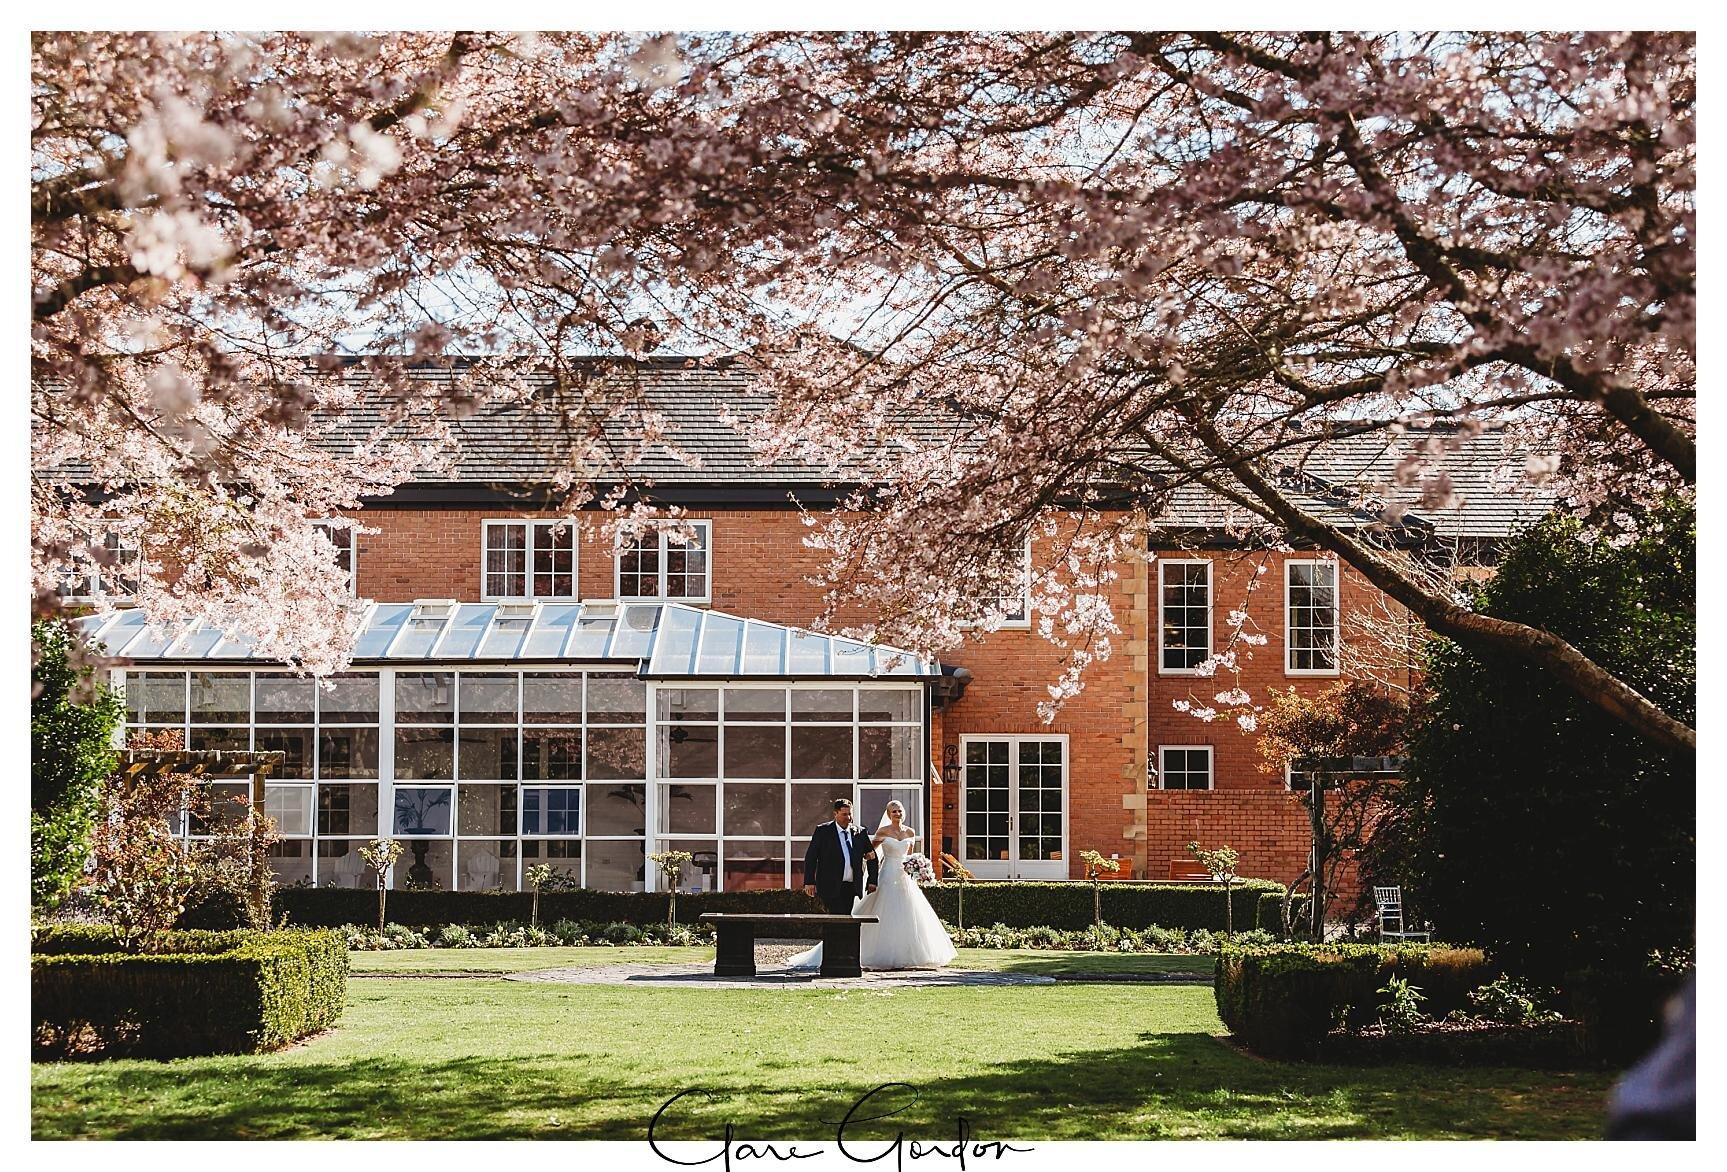 Henley-Hotel-Cherry-blossom-wedding-photos (42).jpg